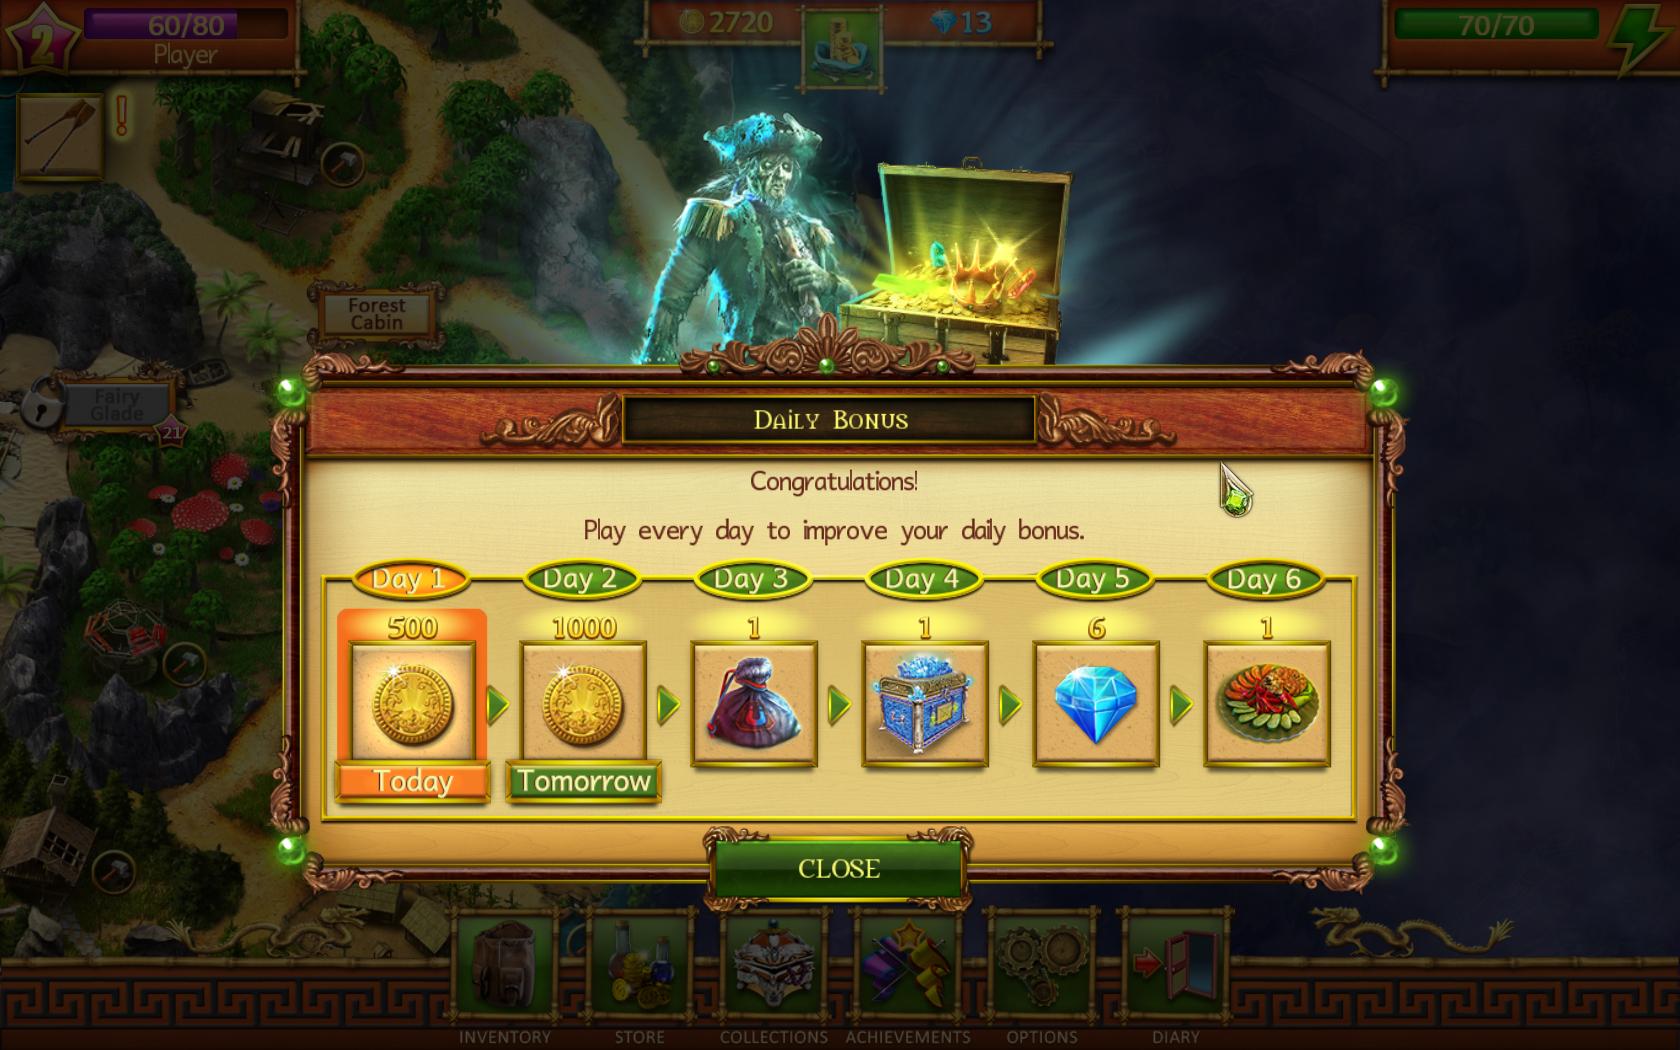 Lost Lands: Mahjong on Steam